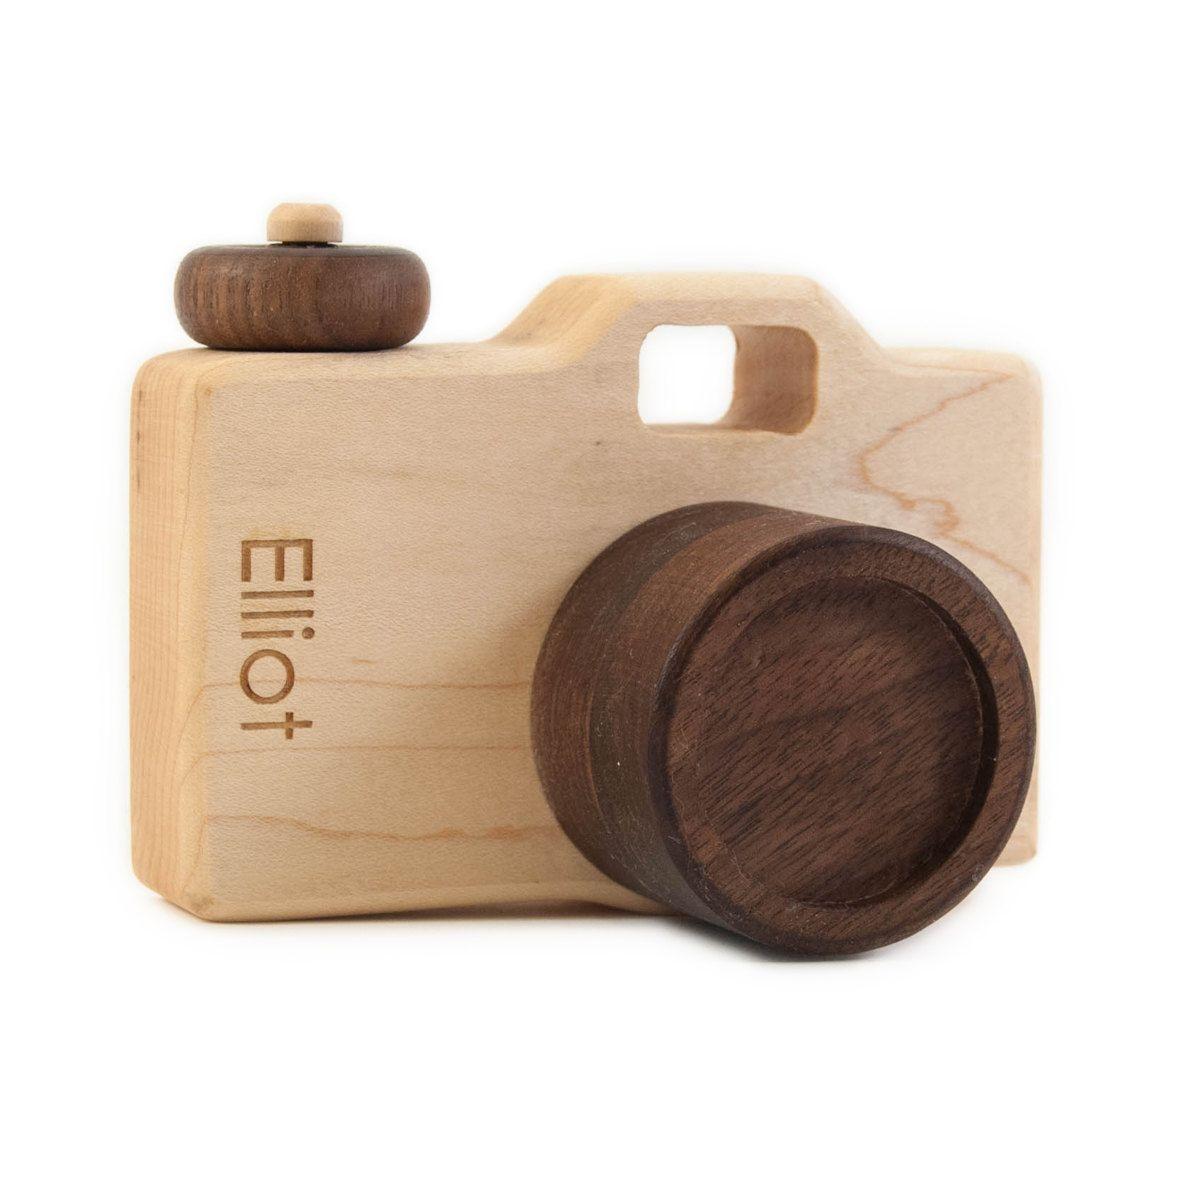 Personalized Wooden Toy Camera Modern Organic Imagination